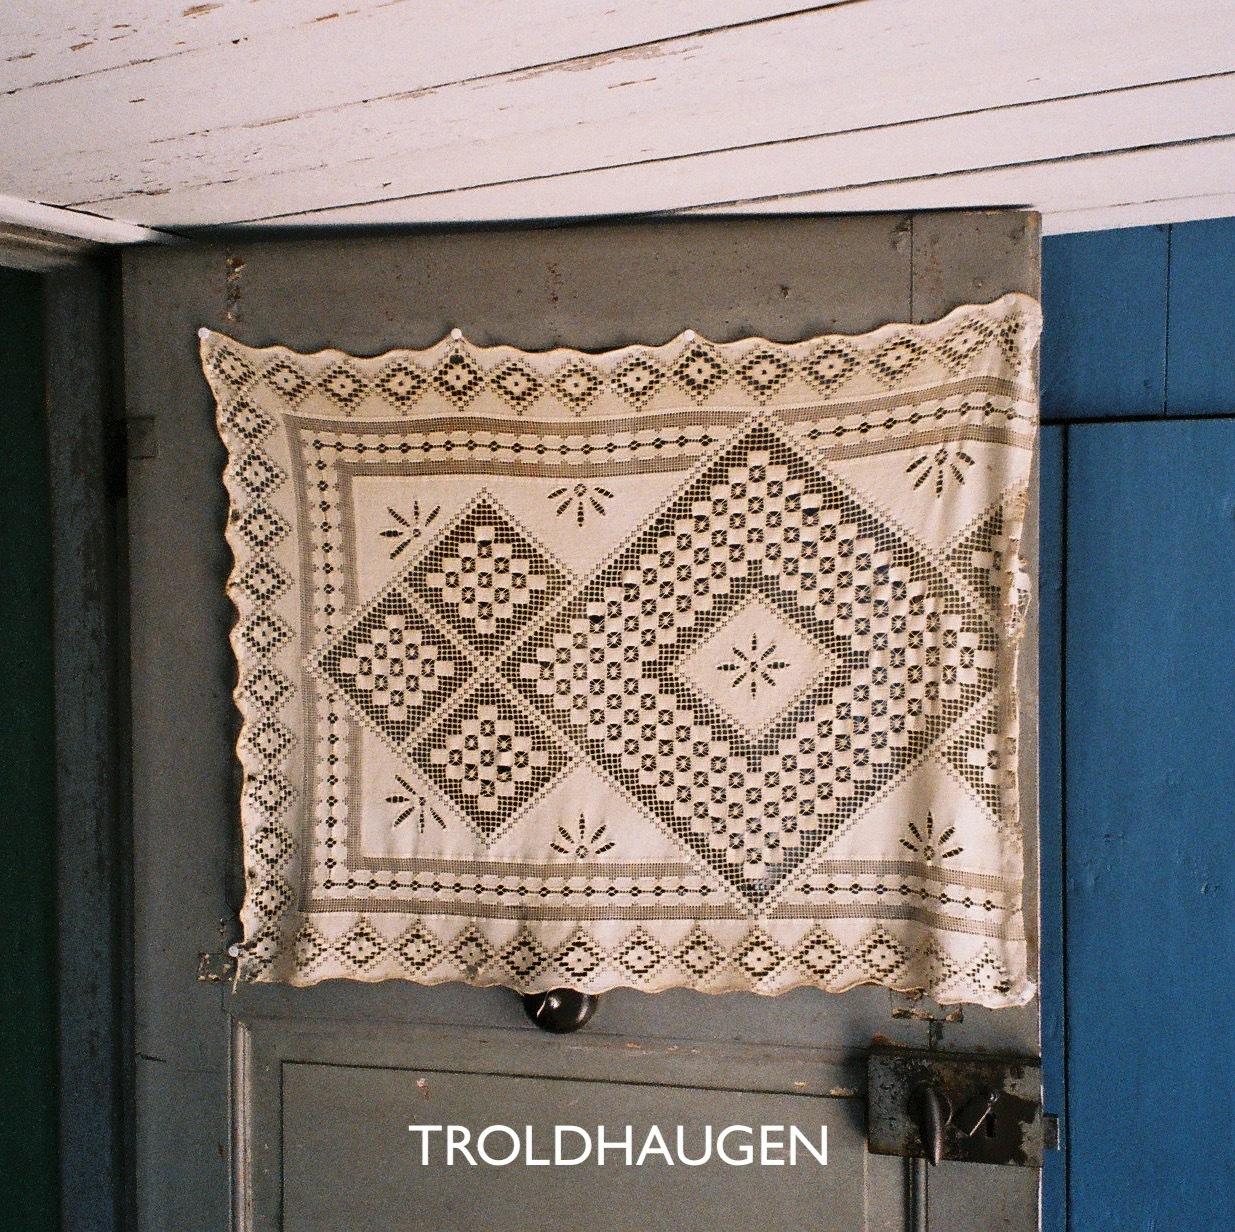 troldhaugen antiques  | 北欧アンティーク・古道具